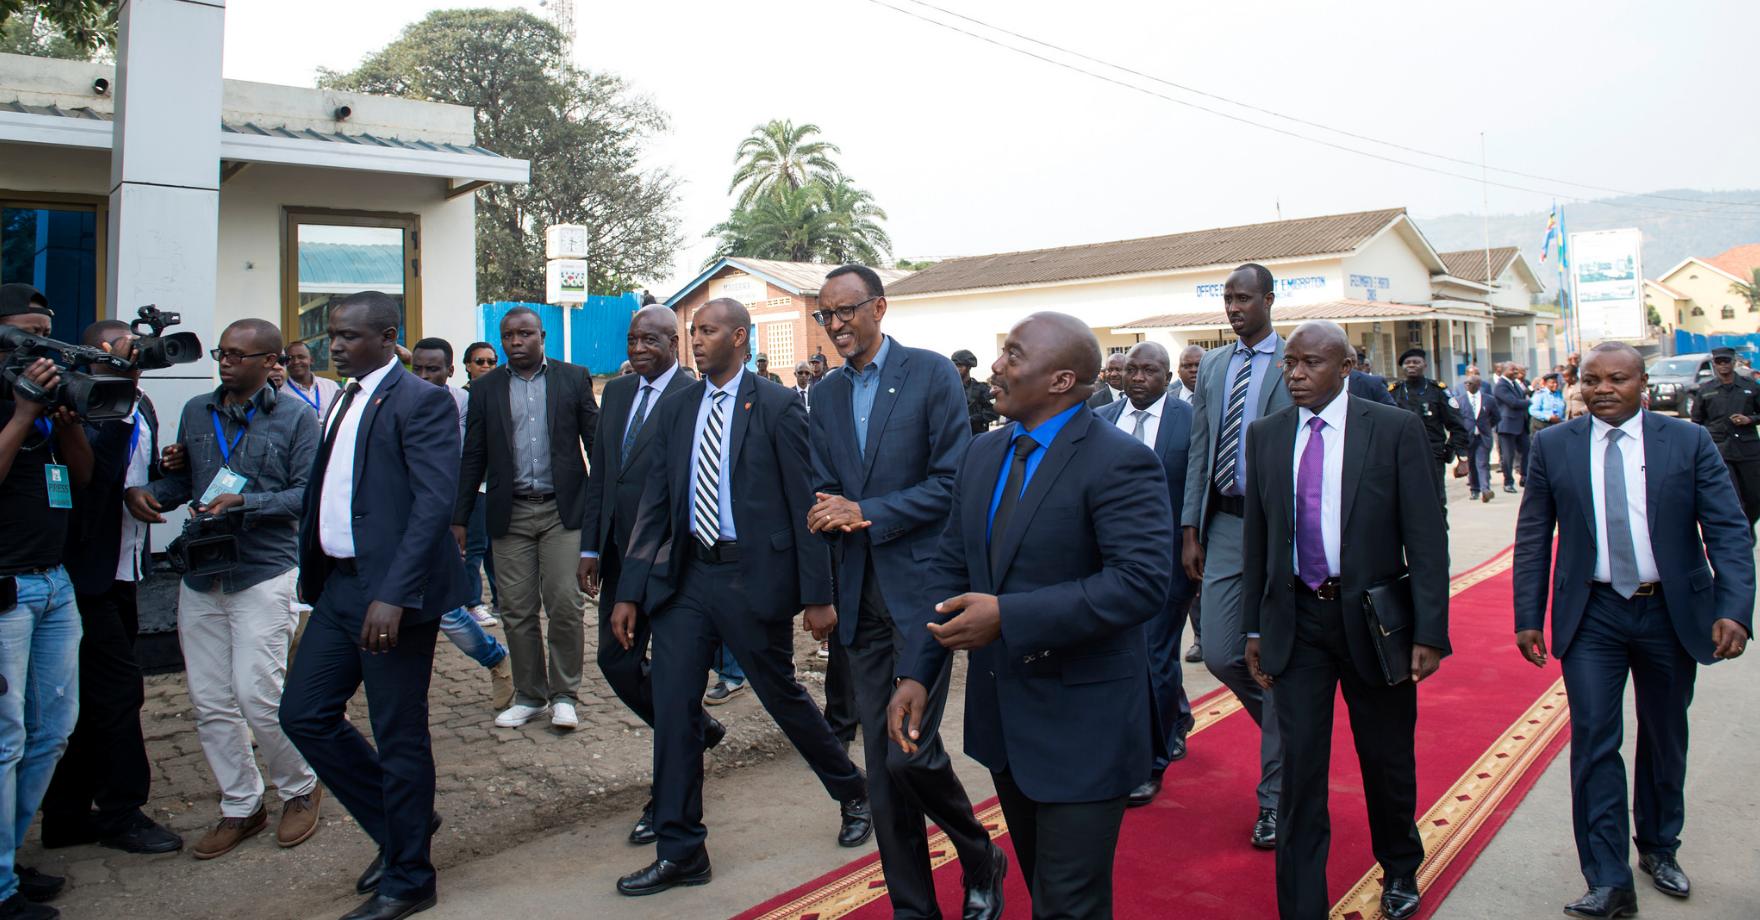 President Paul Kagame and President Joseph Kabila chat in Rubavu city